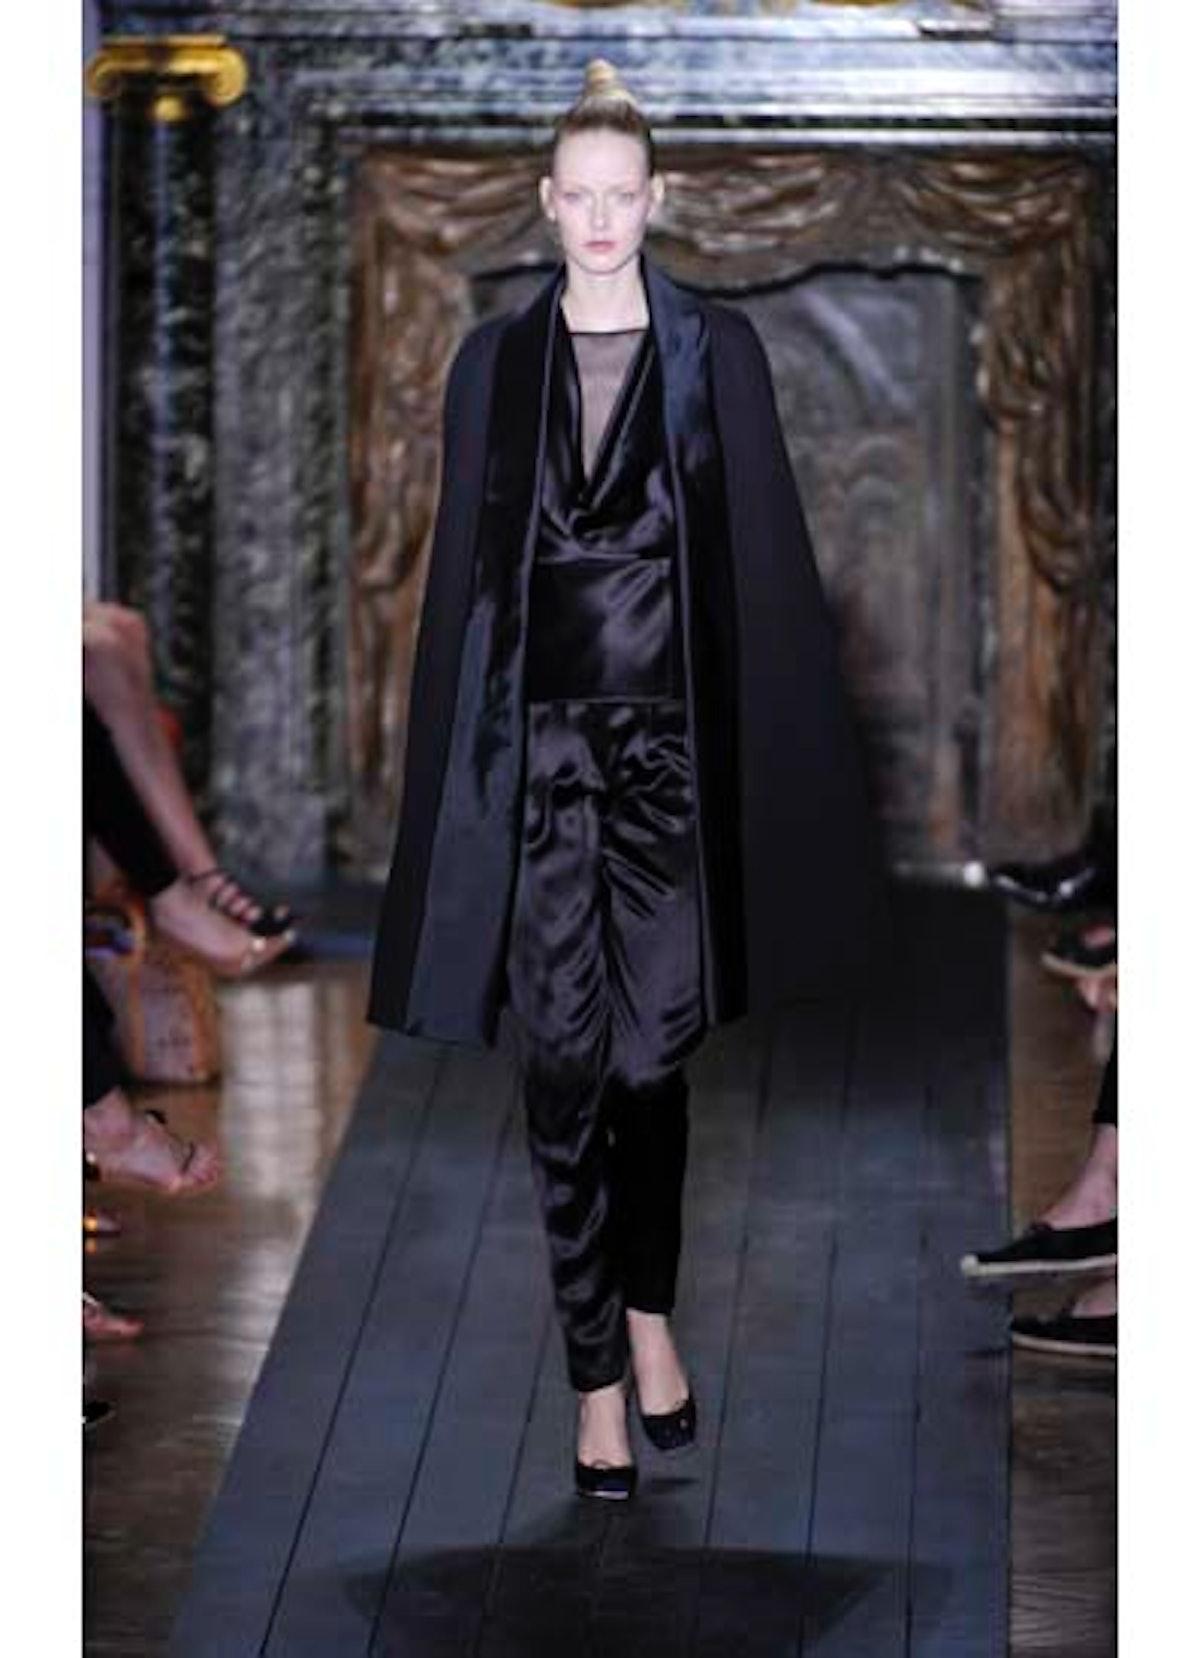 fass-valentino-couture-2012-runway-24-v.jpg